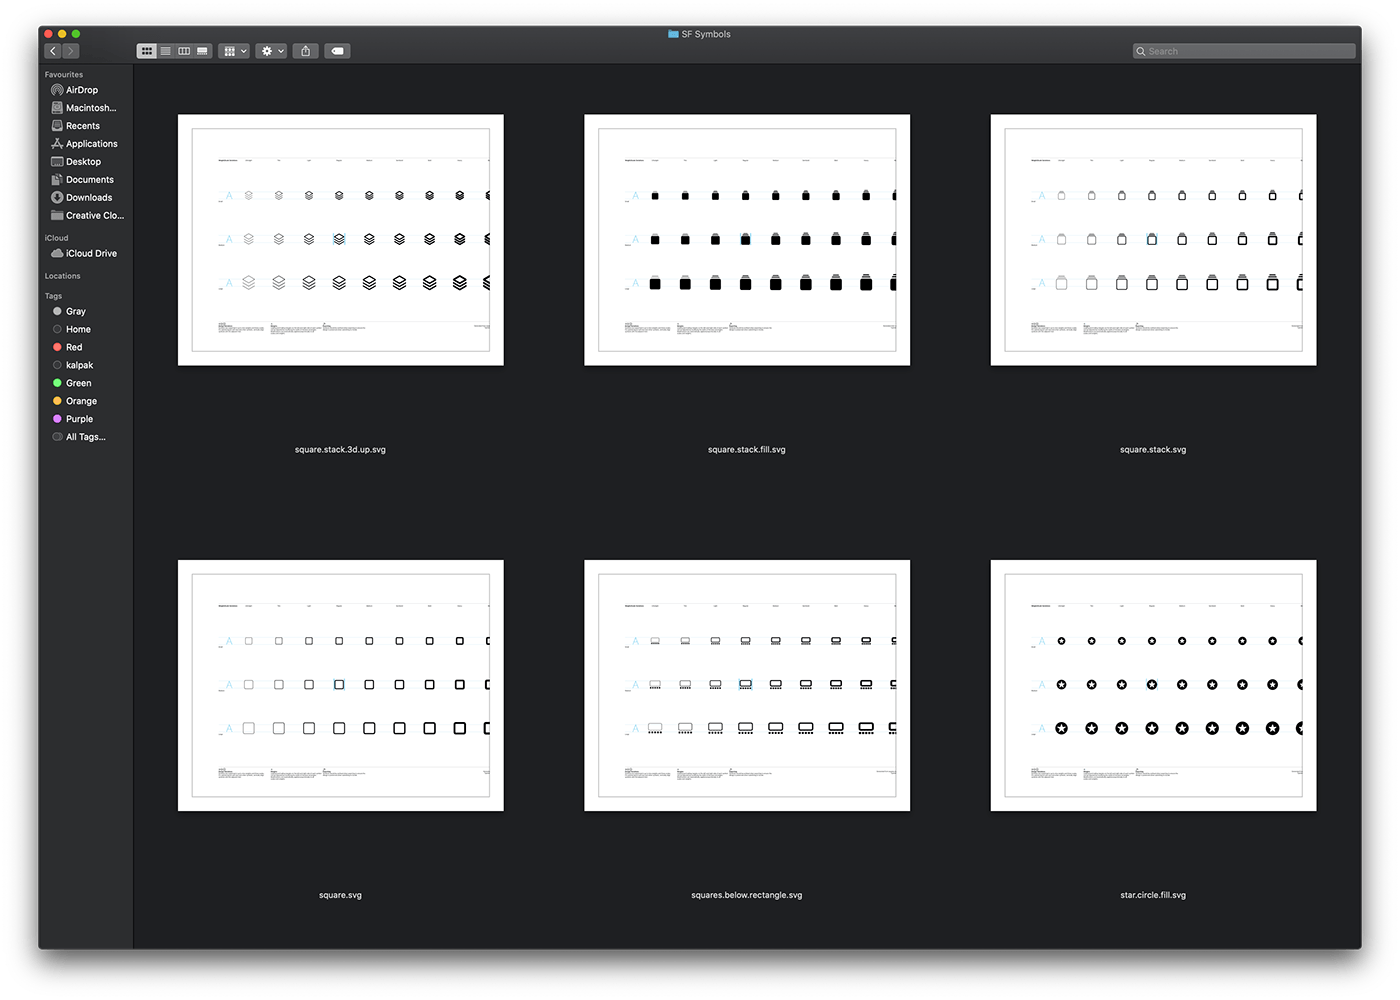 ios,iso10,iOS11,Native,icons,vector,iOS12,glyhps,sf symbols,Icon